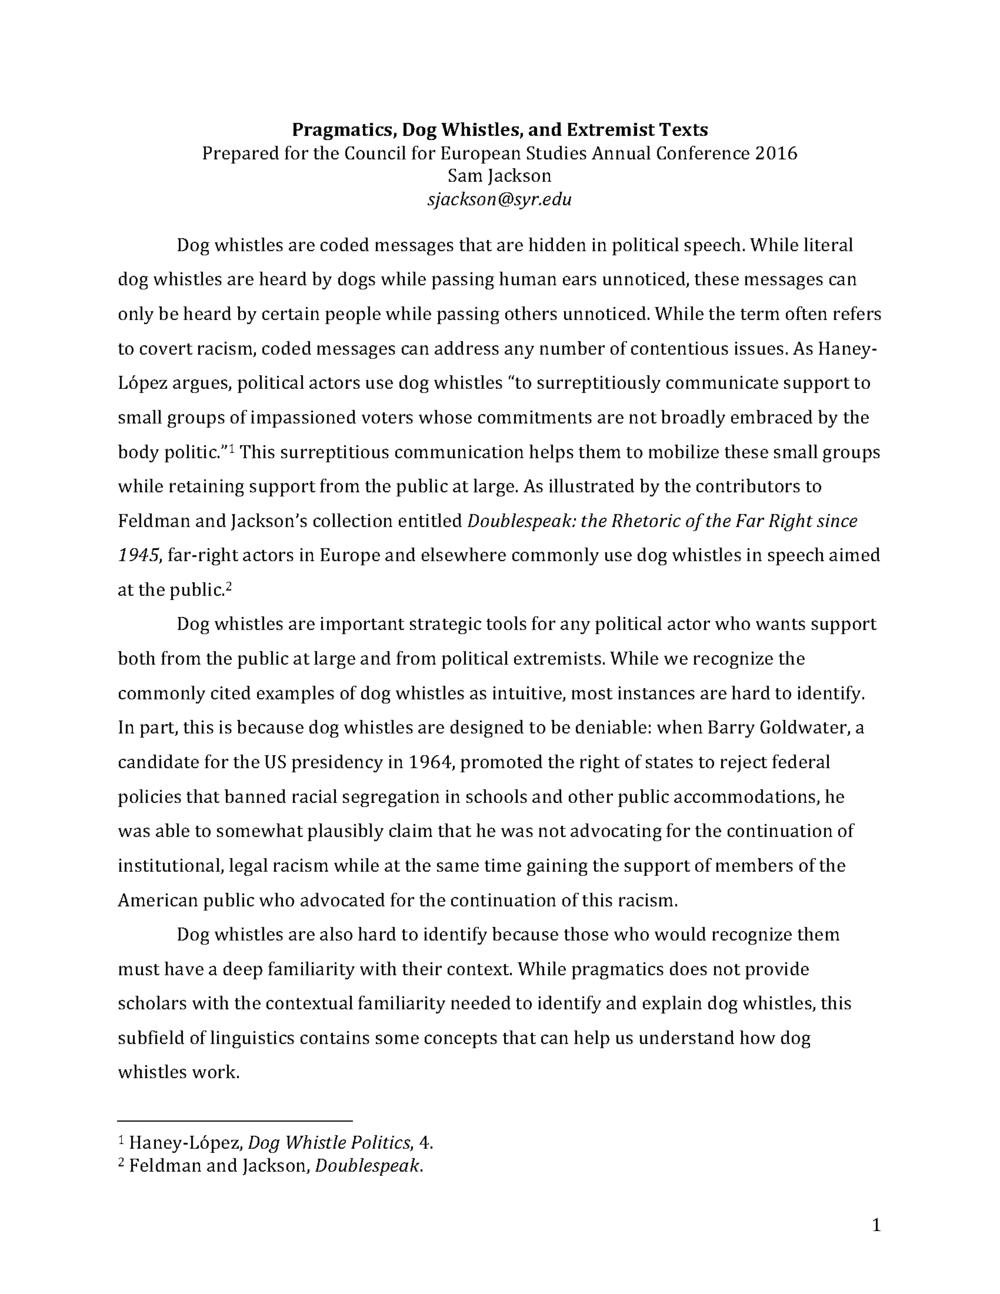 Pragmatics, Dog Whistles, and Extremist Texts